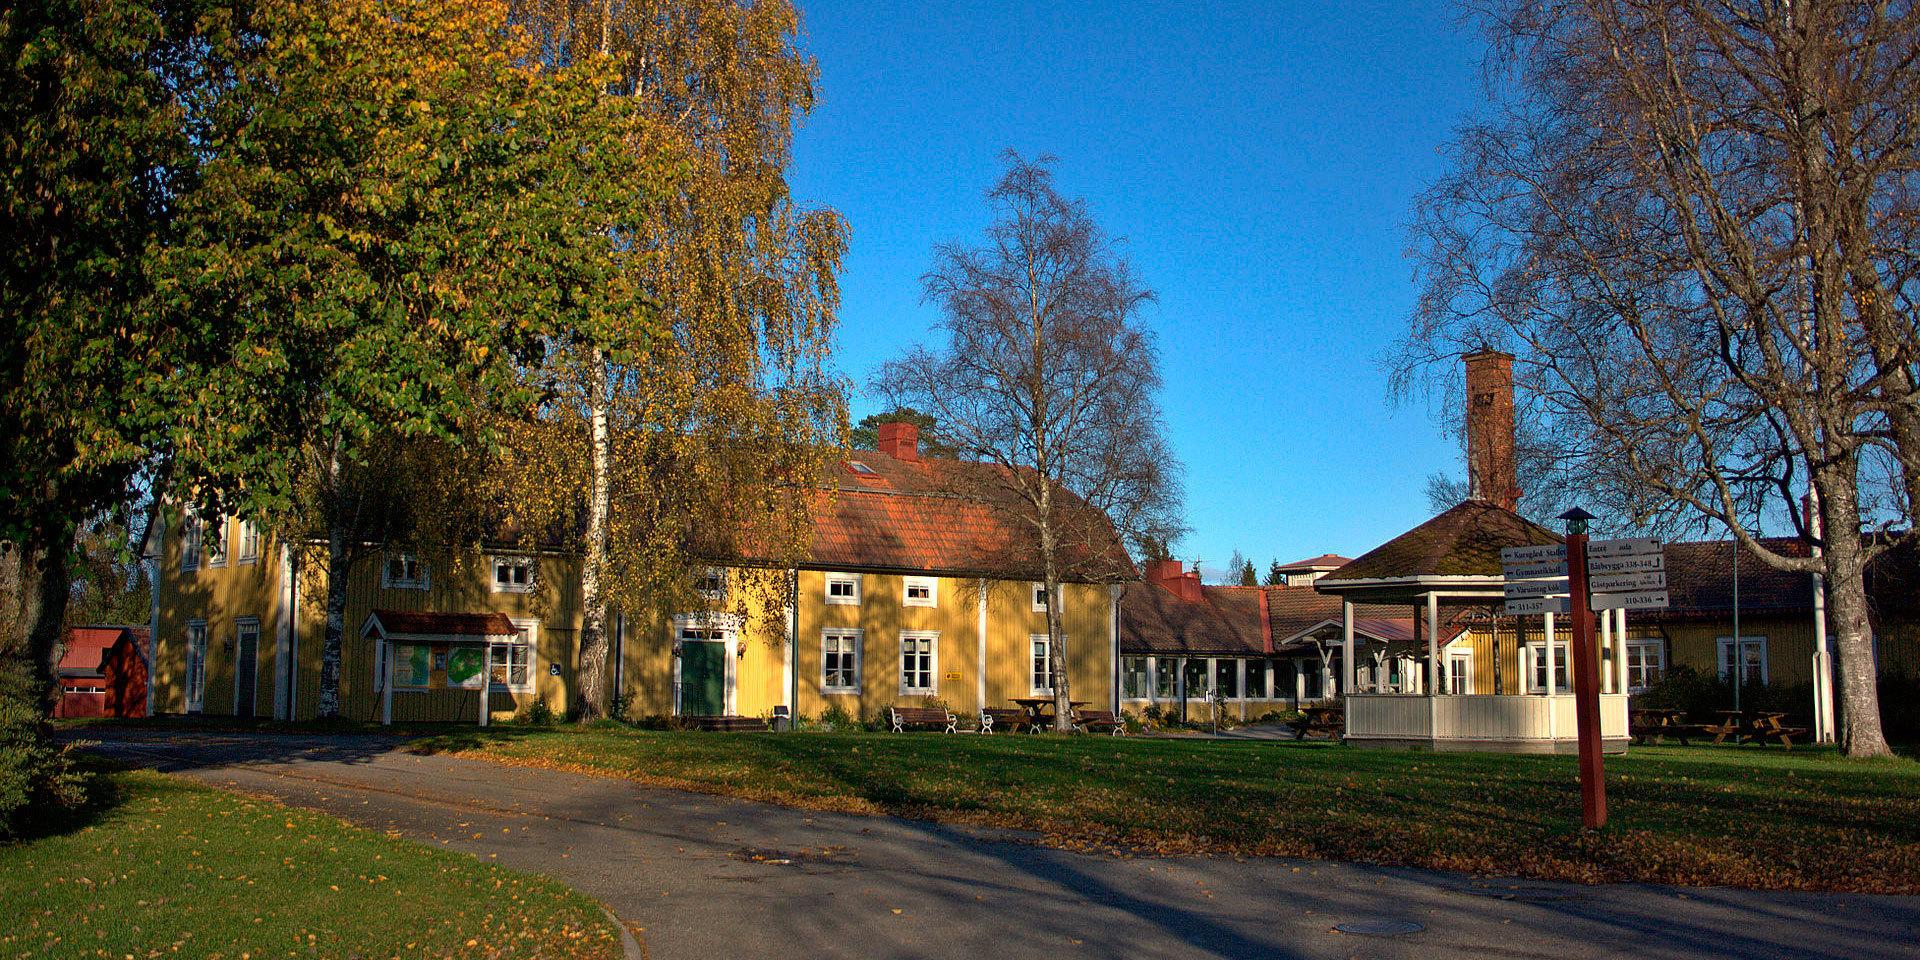 Strlmbäcks Folkhögskola. Foto: Mikael Lindmark